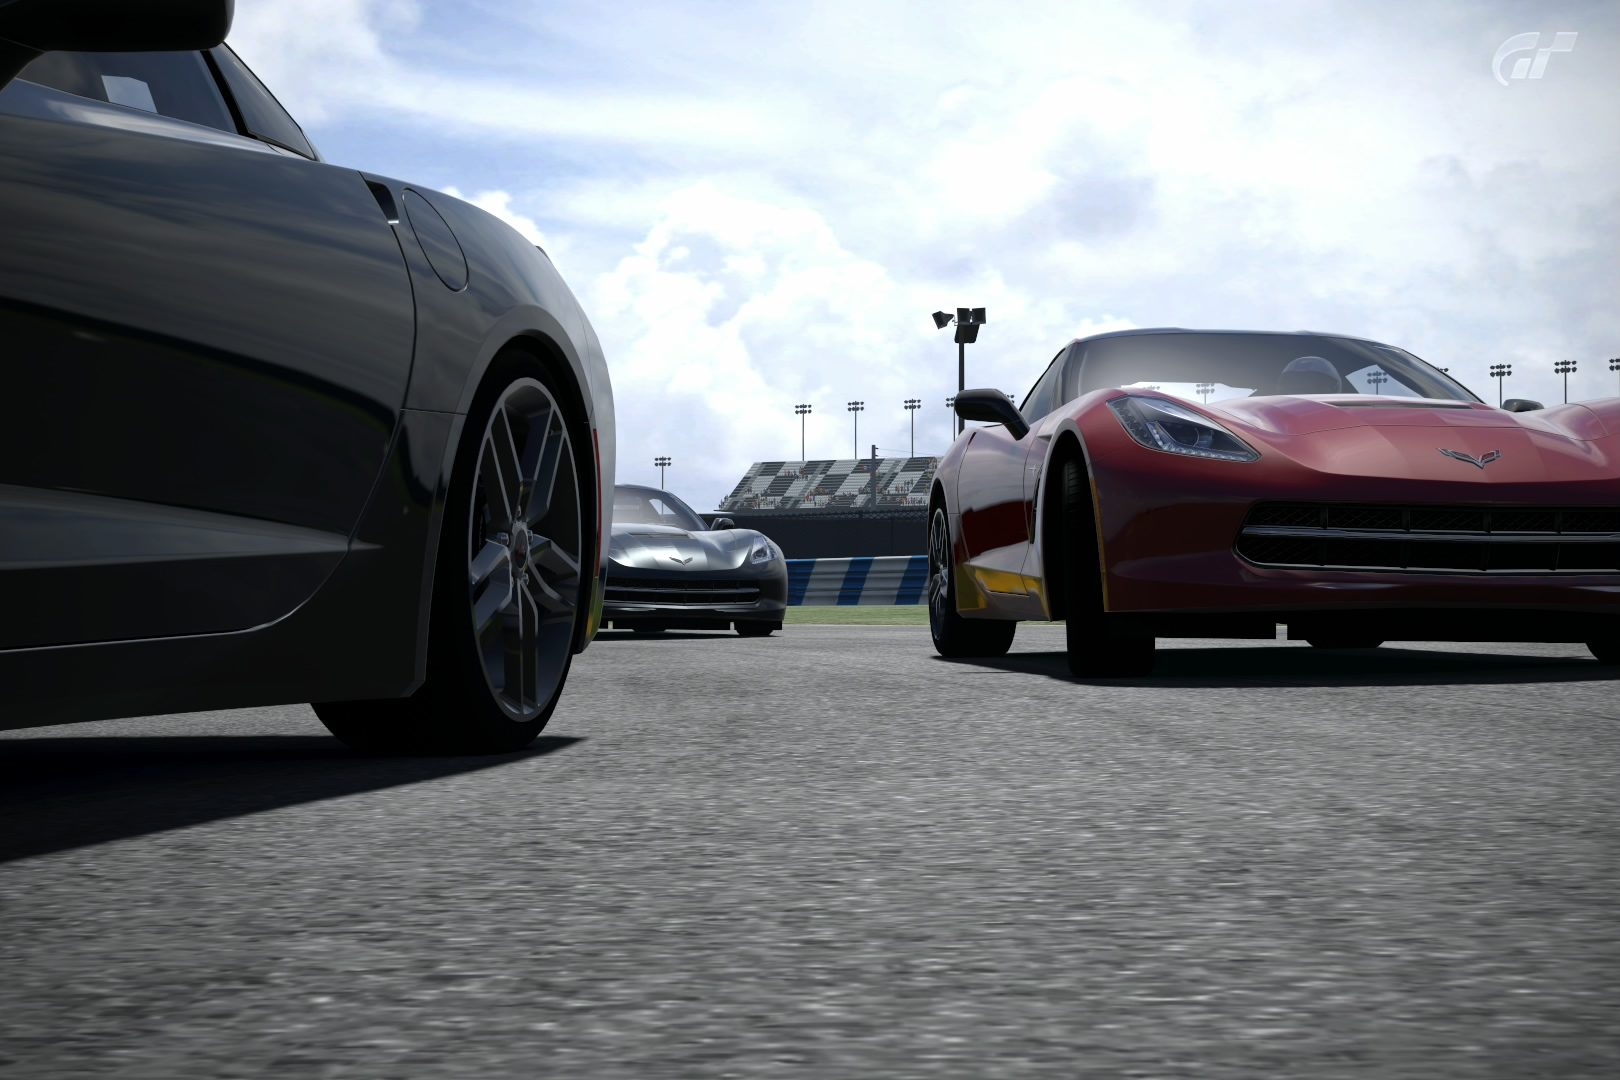 Road Course - Daytona_3.jpg